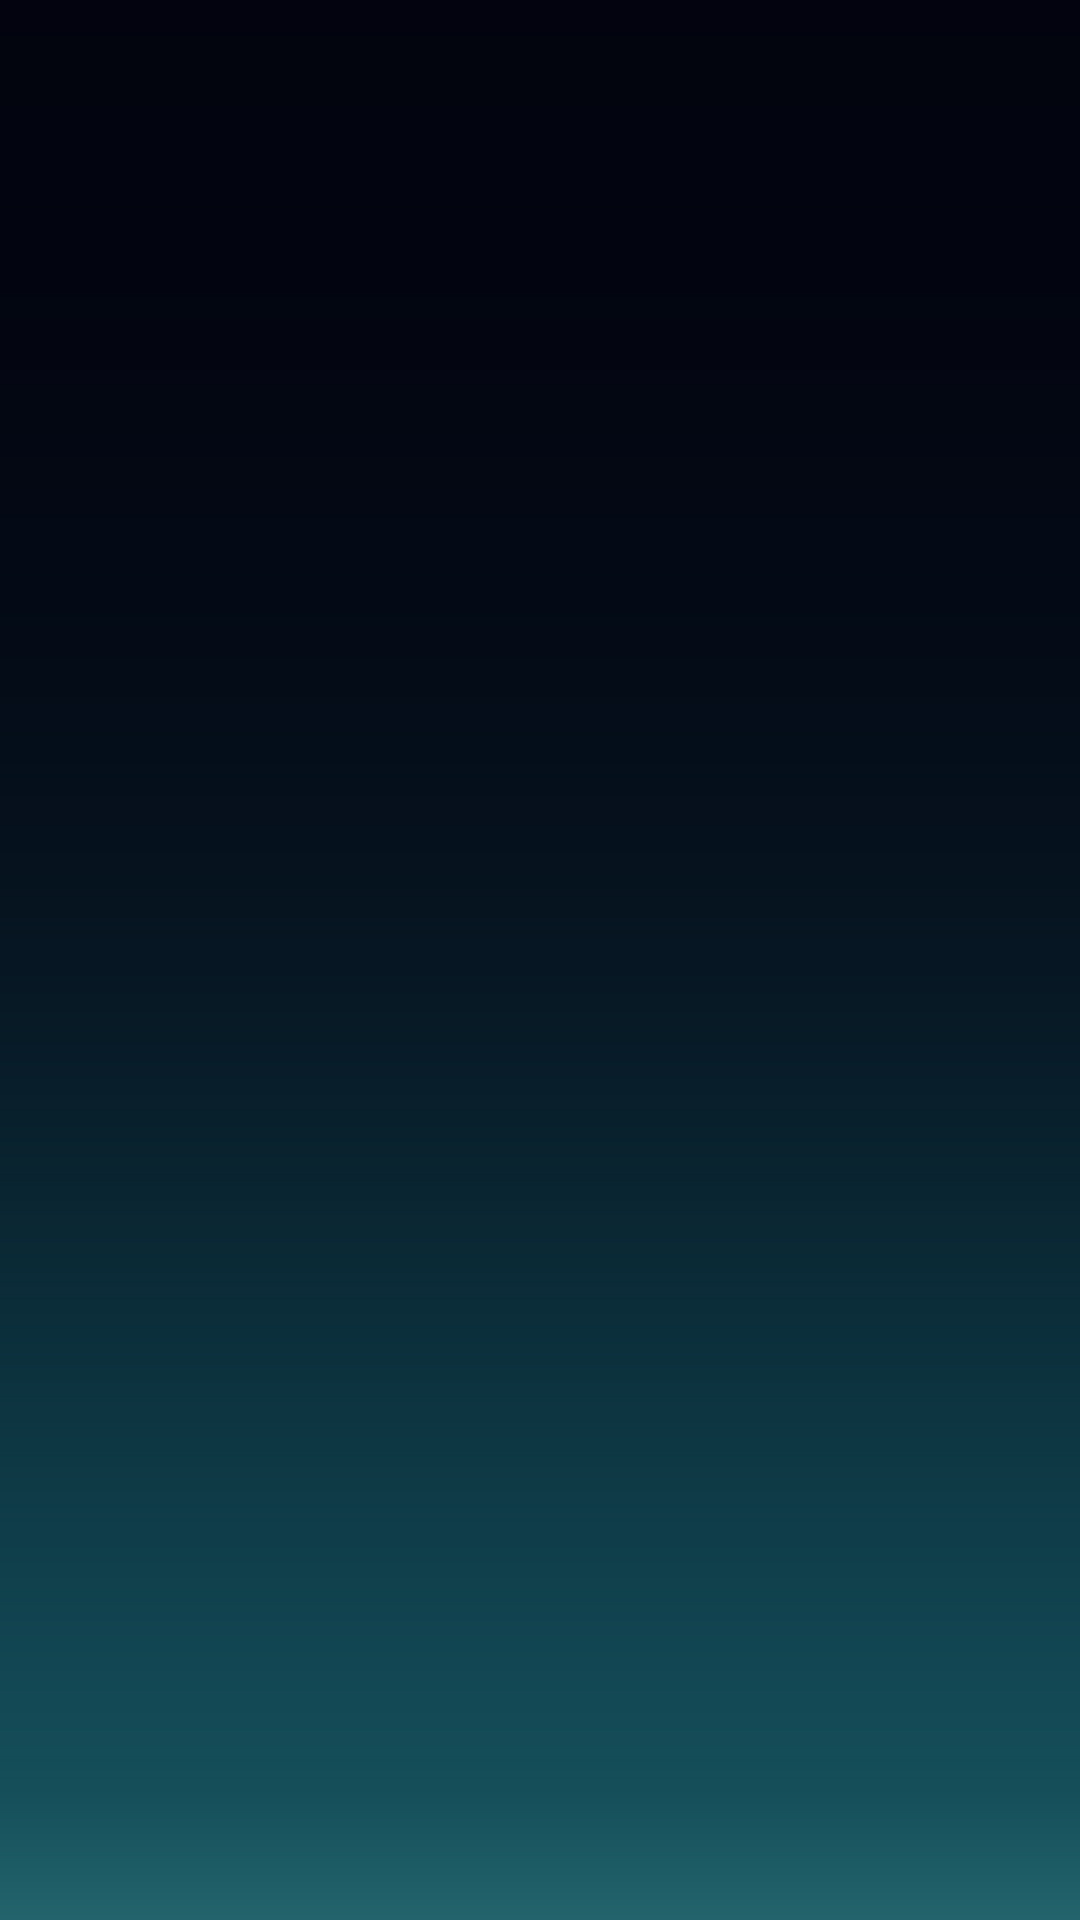 1080x1920 Dark Blue Green Gradient 4k Iphone 7 6s 6 Plus Pixel Xl